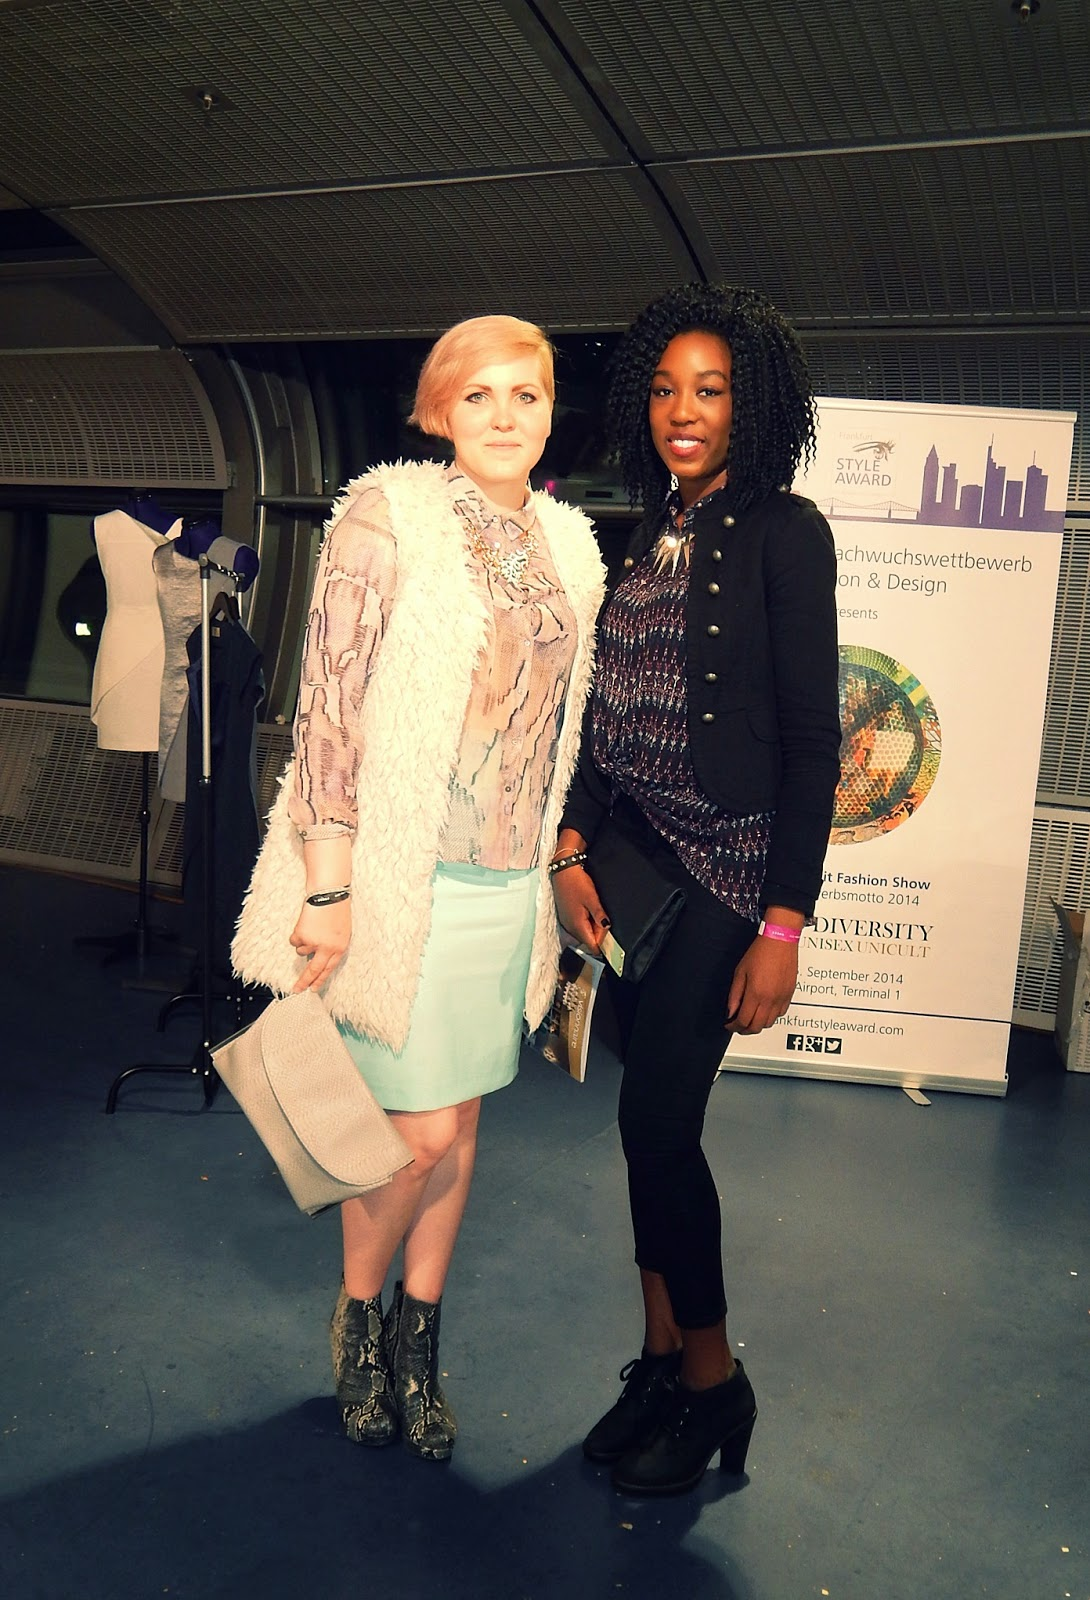 Frankfurt Style Awards